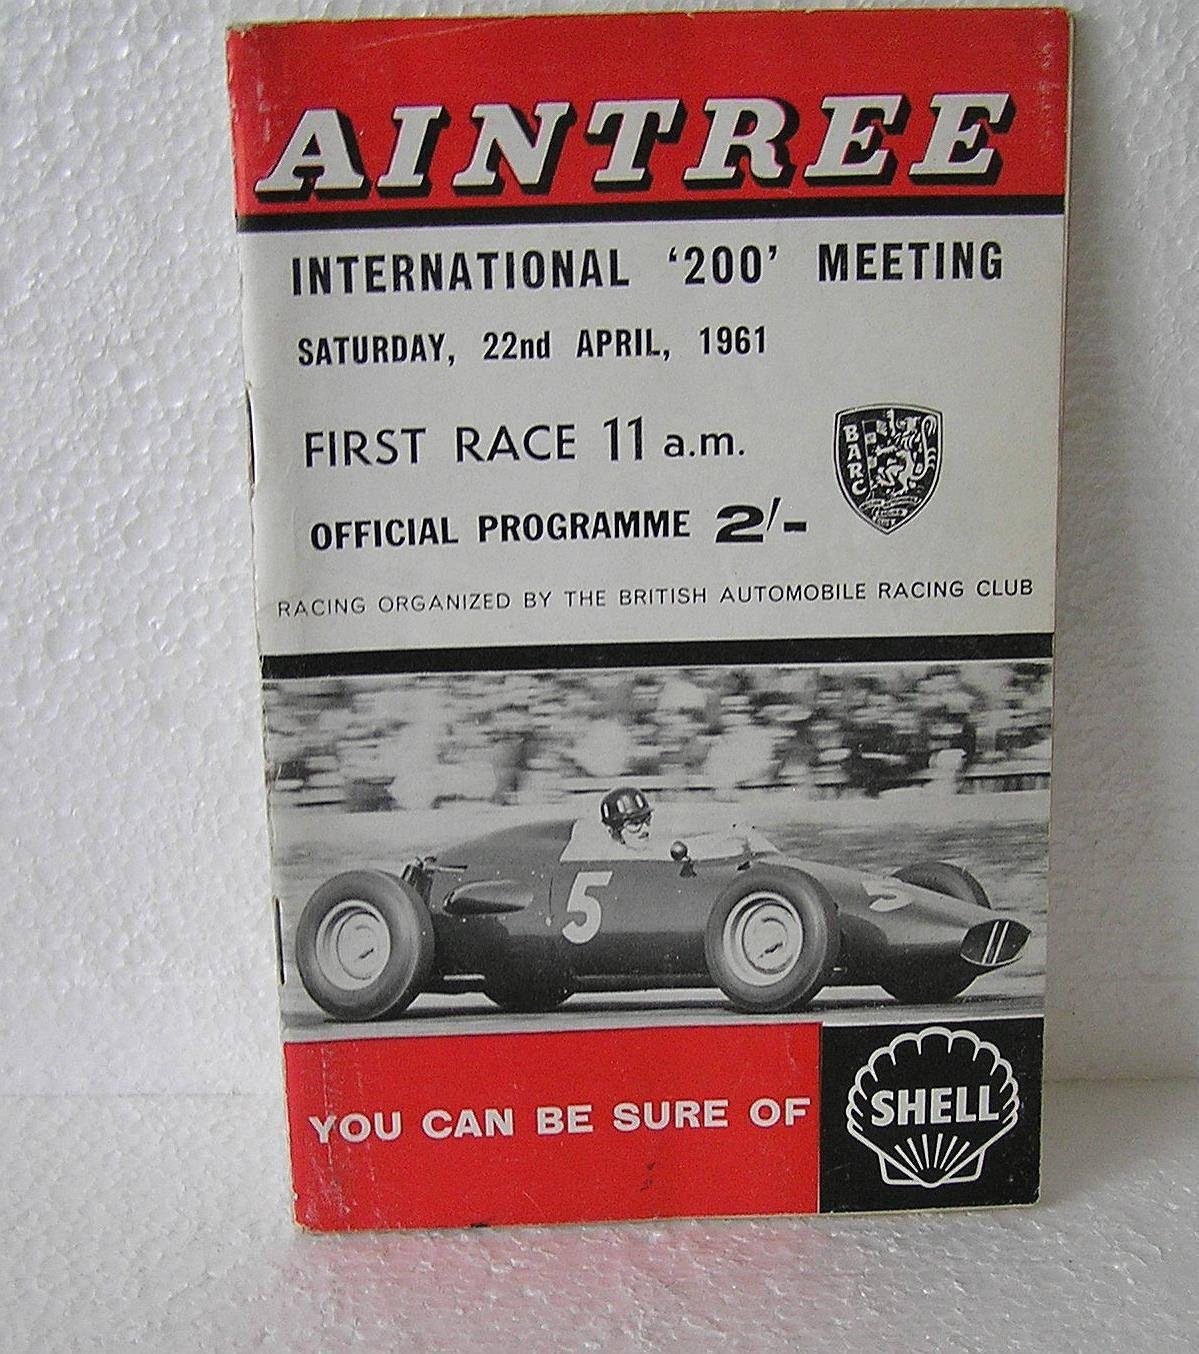 Aintree International 200 Motor Race Meeting Saturday April 22th 1961 Program By Lakedistrictephemera On Etsy Racing How To Memorize Things International